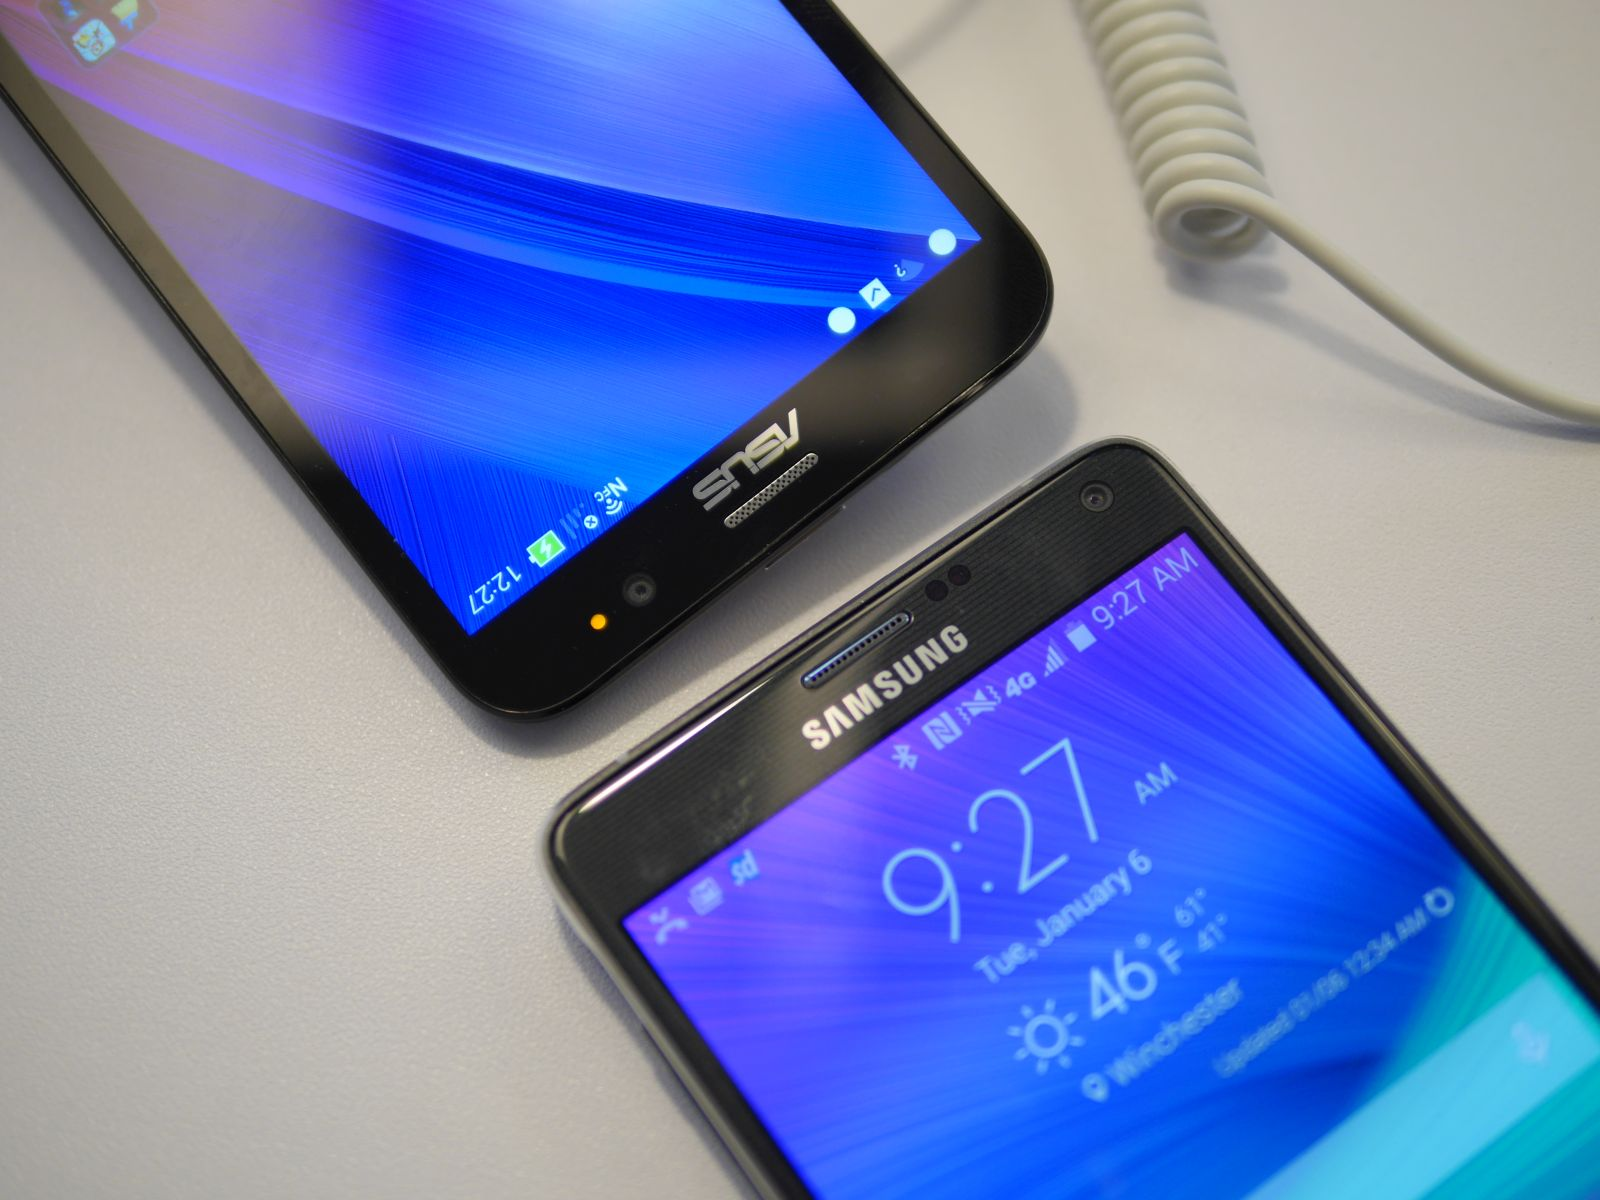 Zenfone 2 vs Note 4 - 5